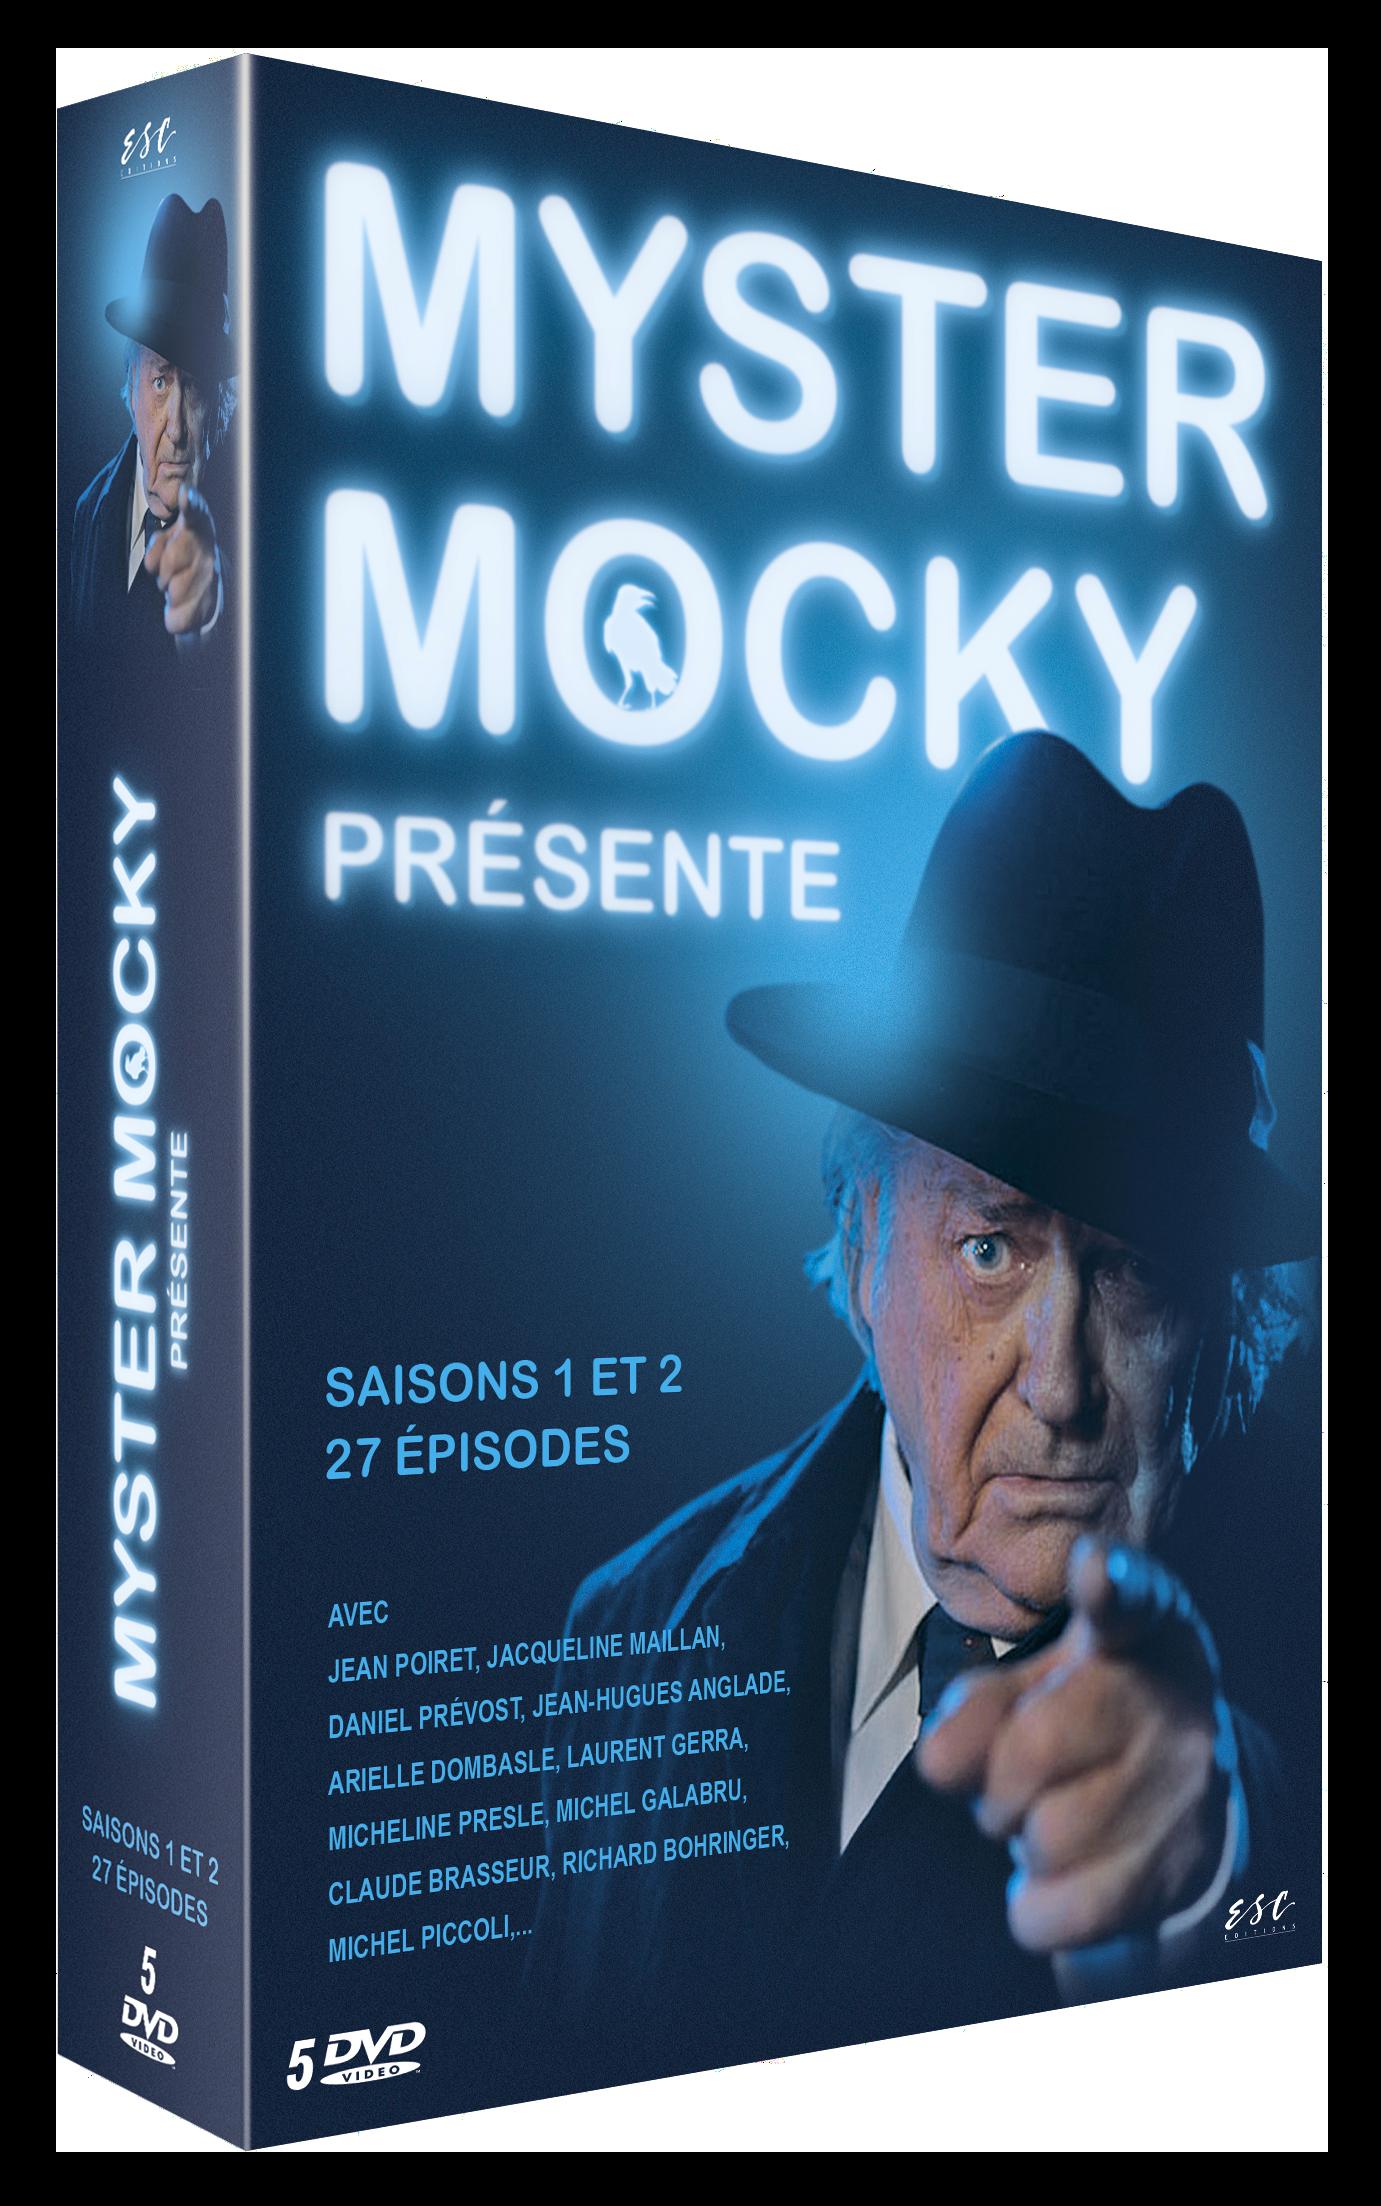 MYSTER MOCKY PRESENTE (Partie 1) - COFFRET 5 DVD